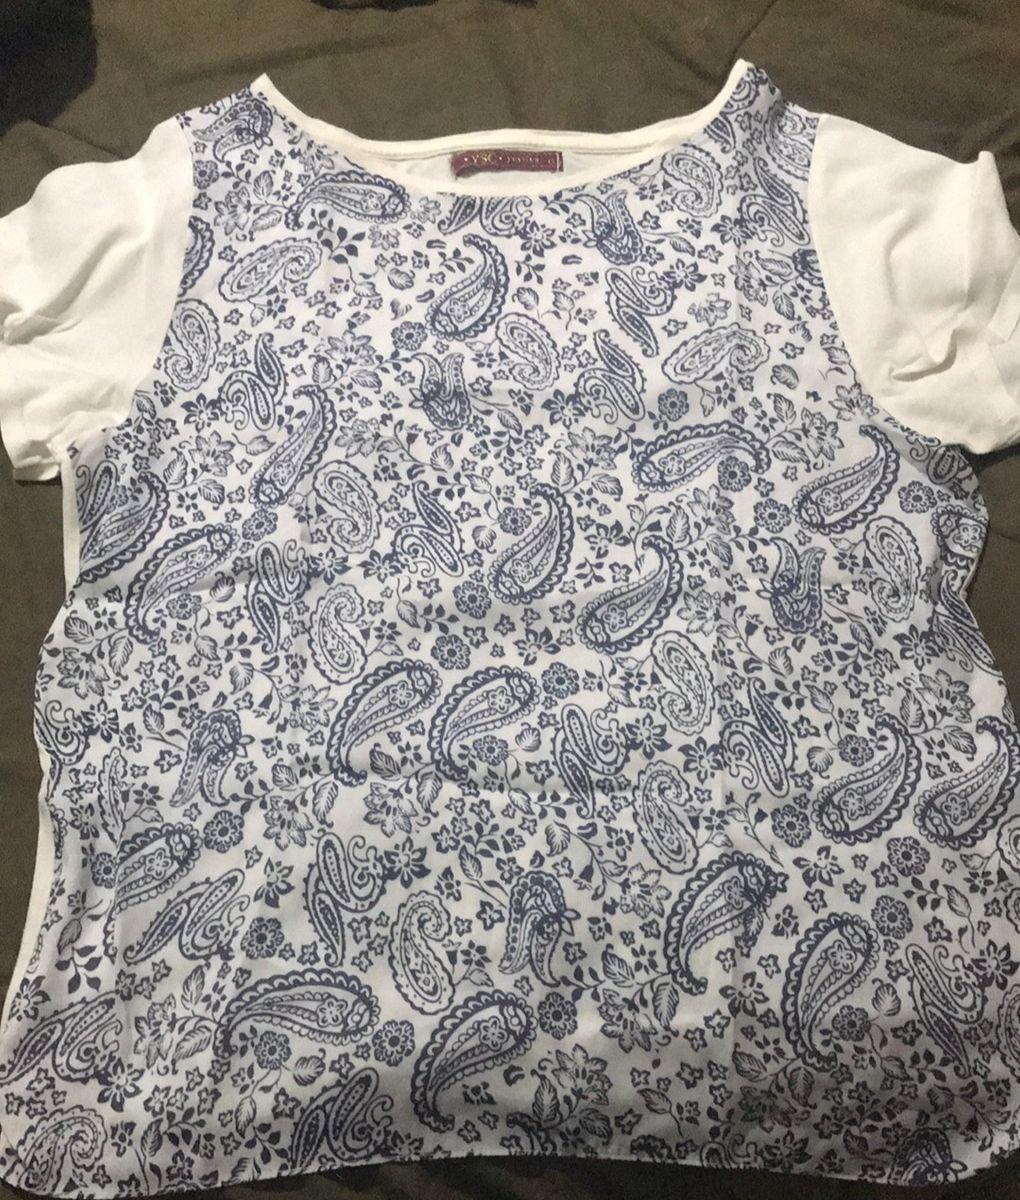 blusinha plaisley - blusas yessica